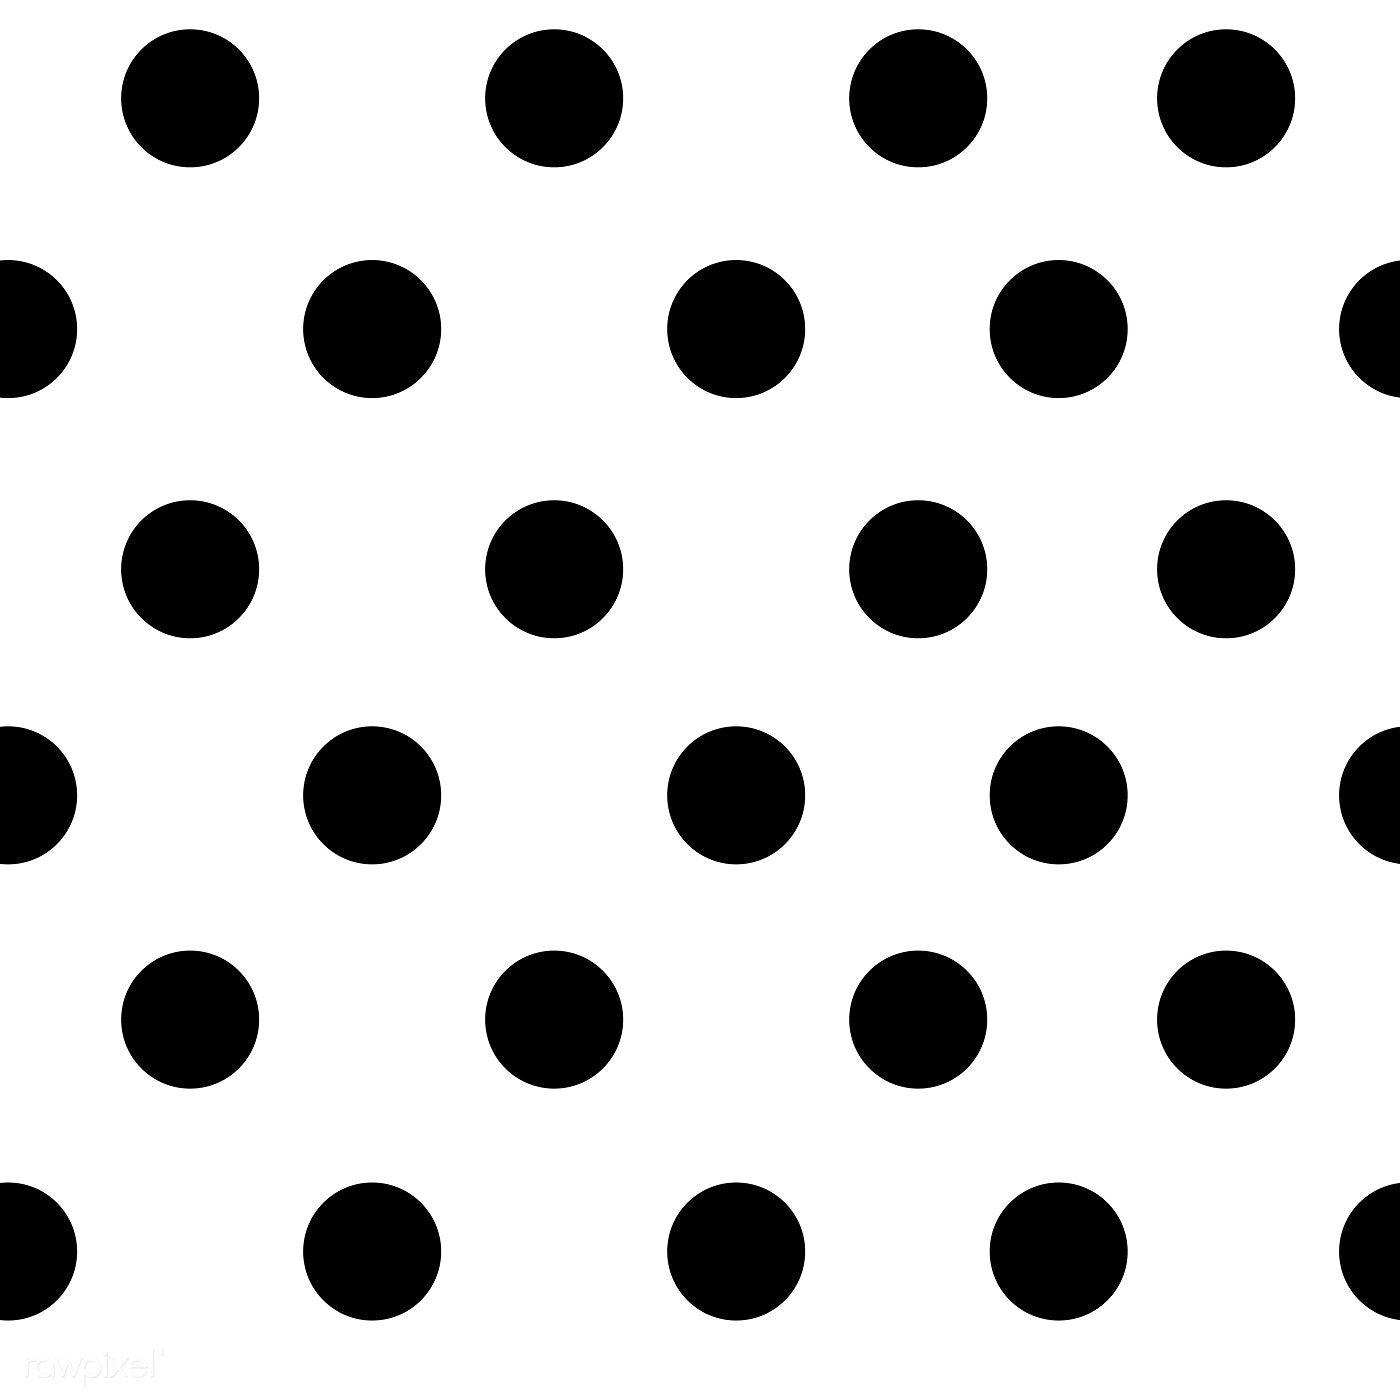 Black and white seamless polka dot pattern vector.